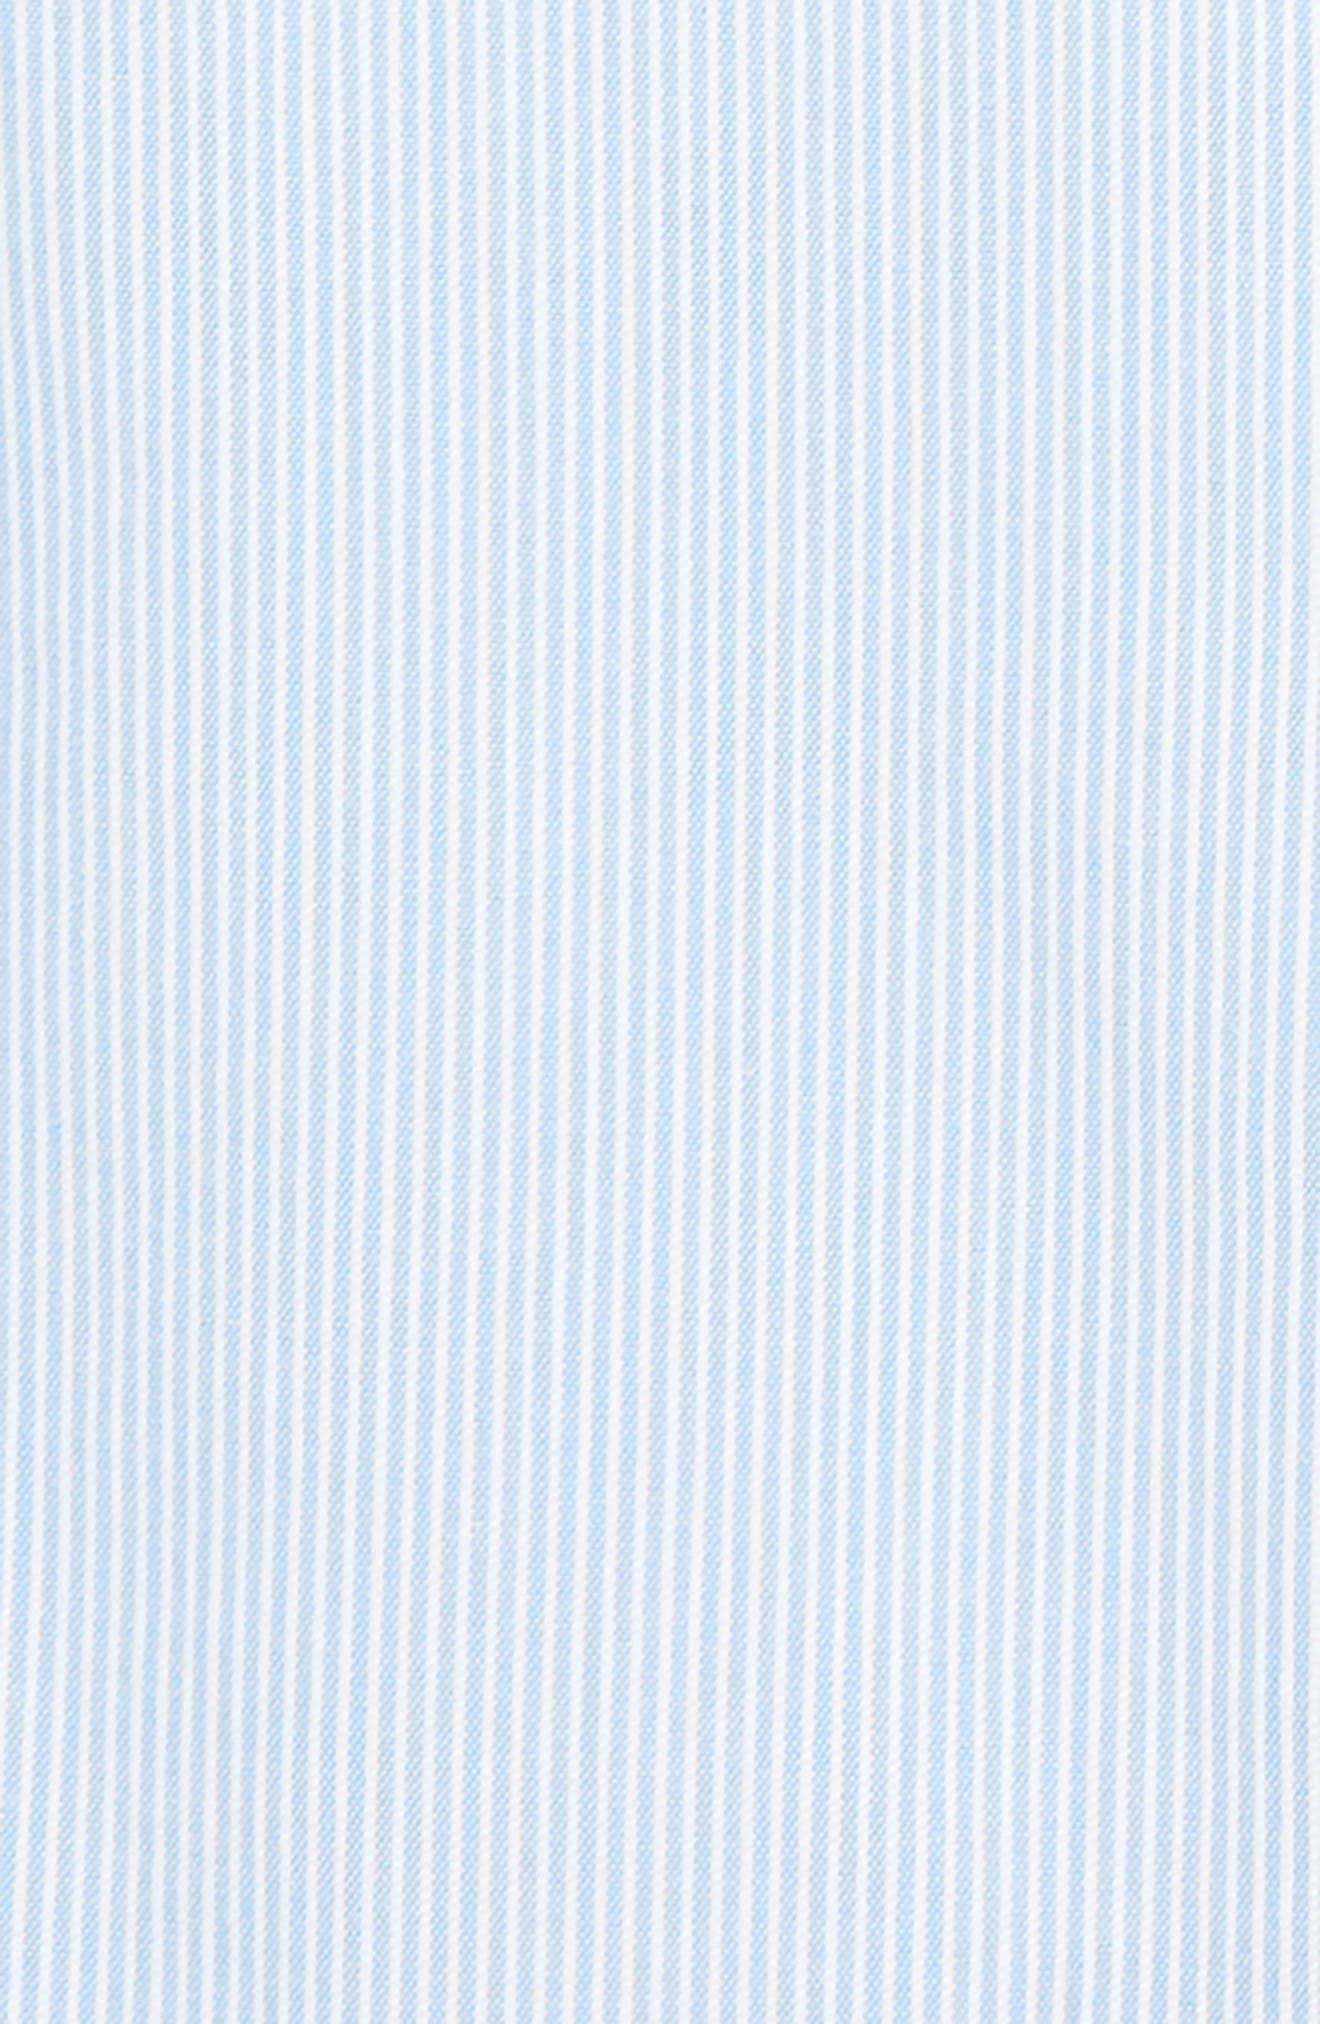 Pincord Stripe Breaker Shorts,                             Alternate thumbnail 2, color,                             Ocean Breeze